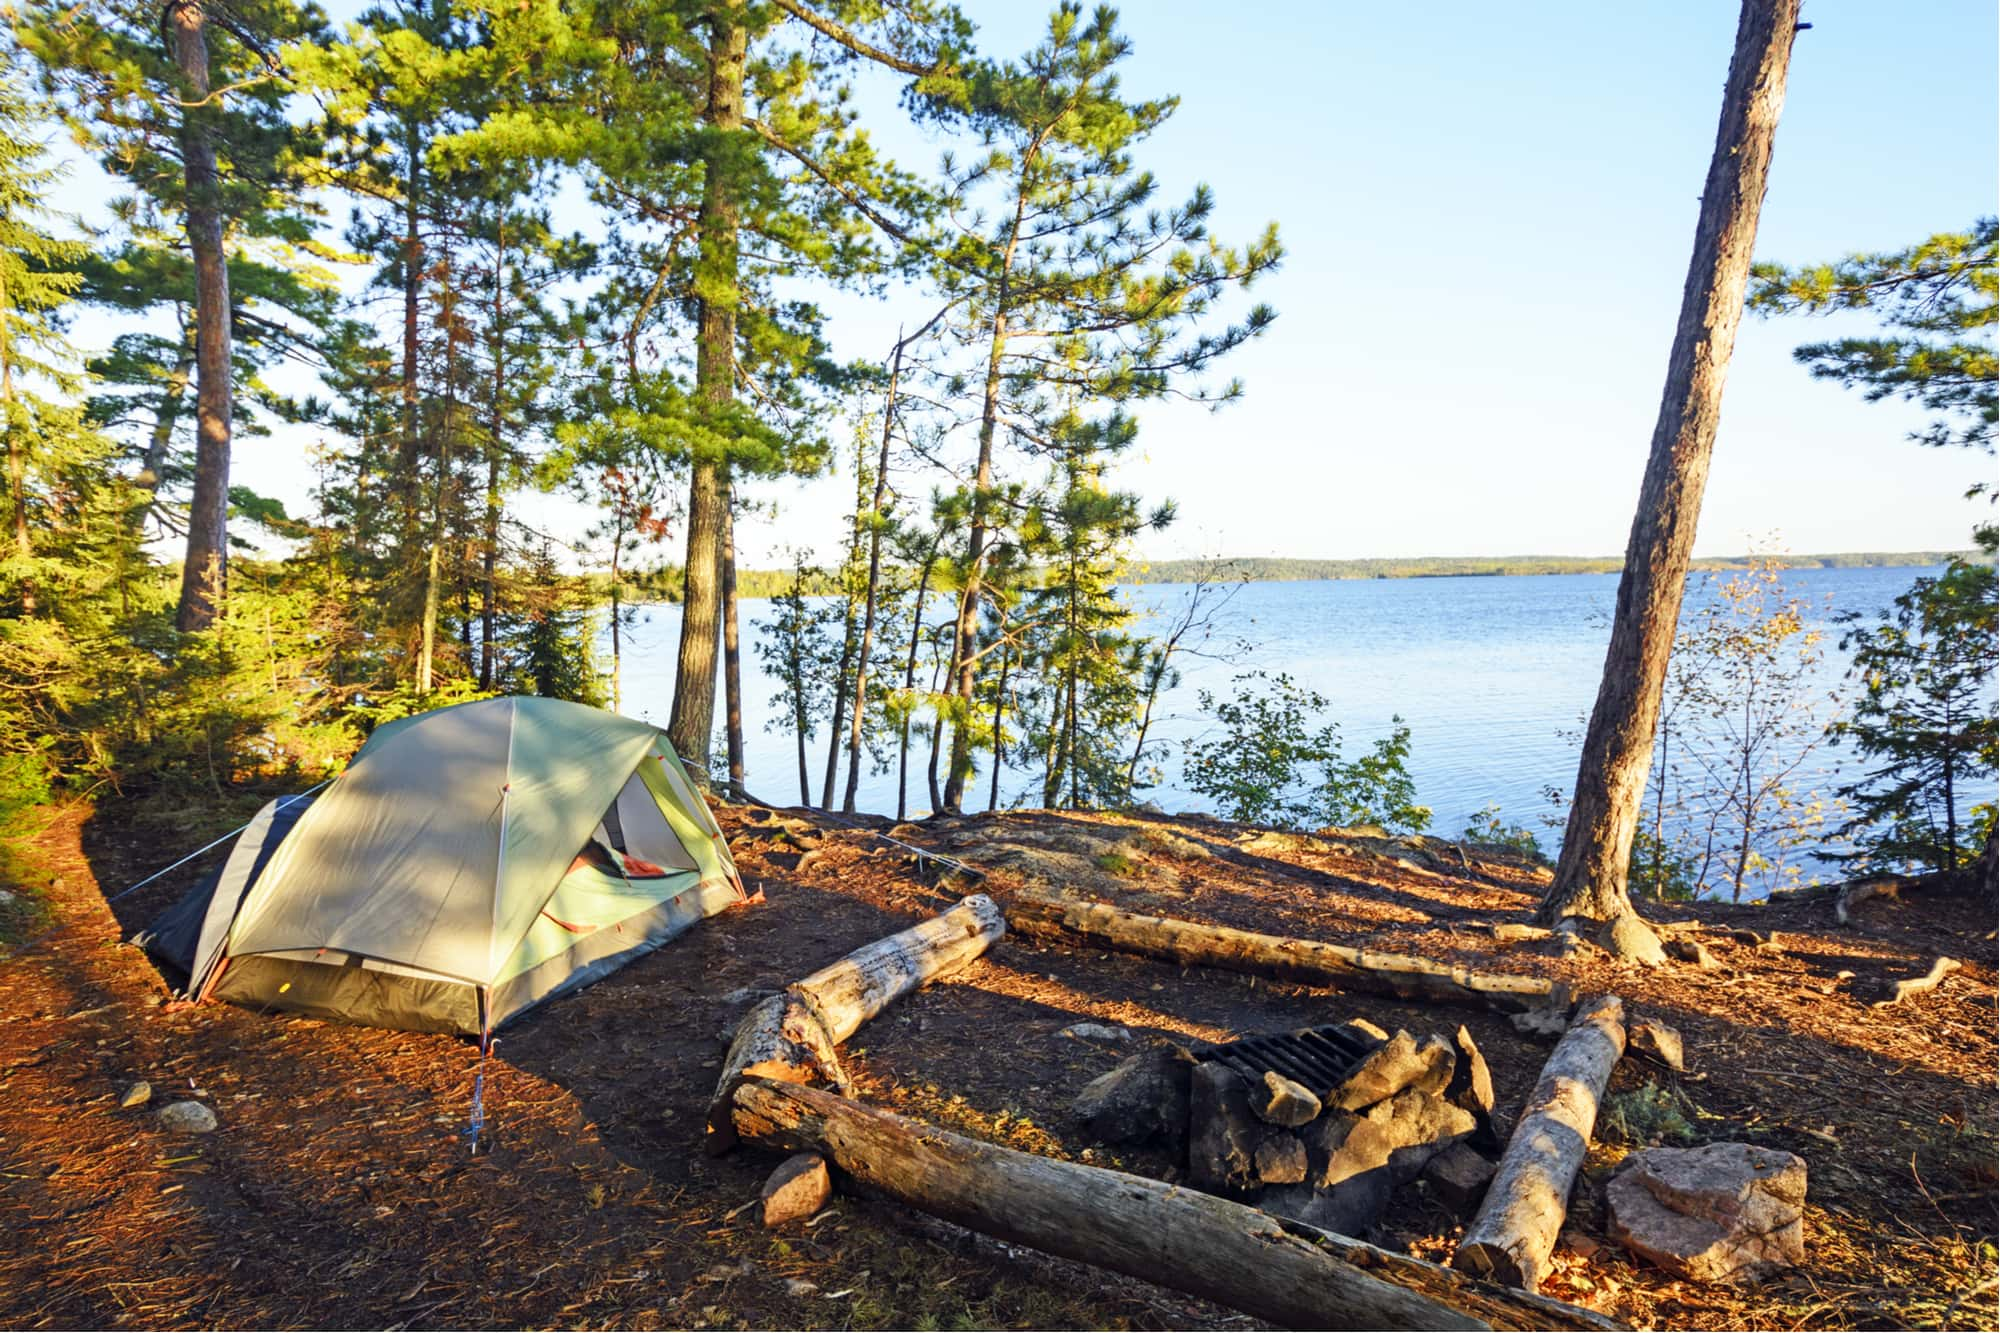 a beach campground set up near a lake in minnesota